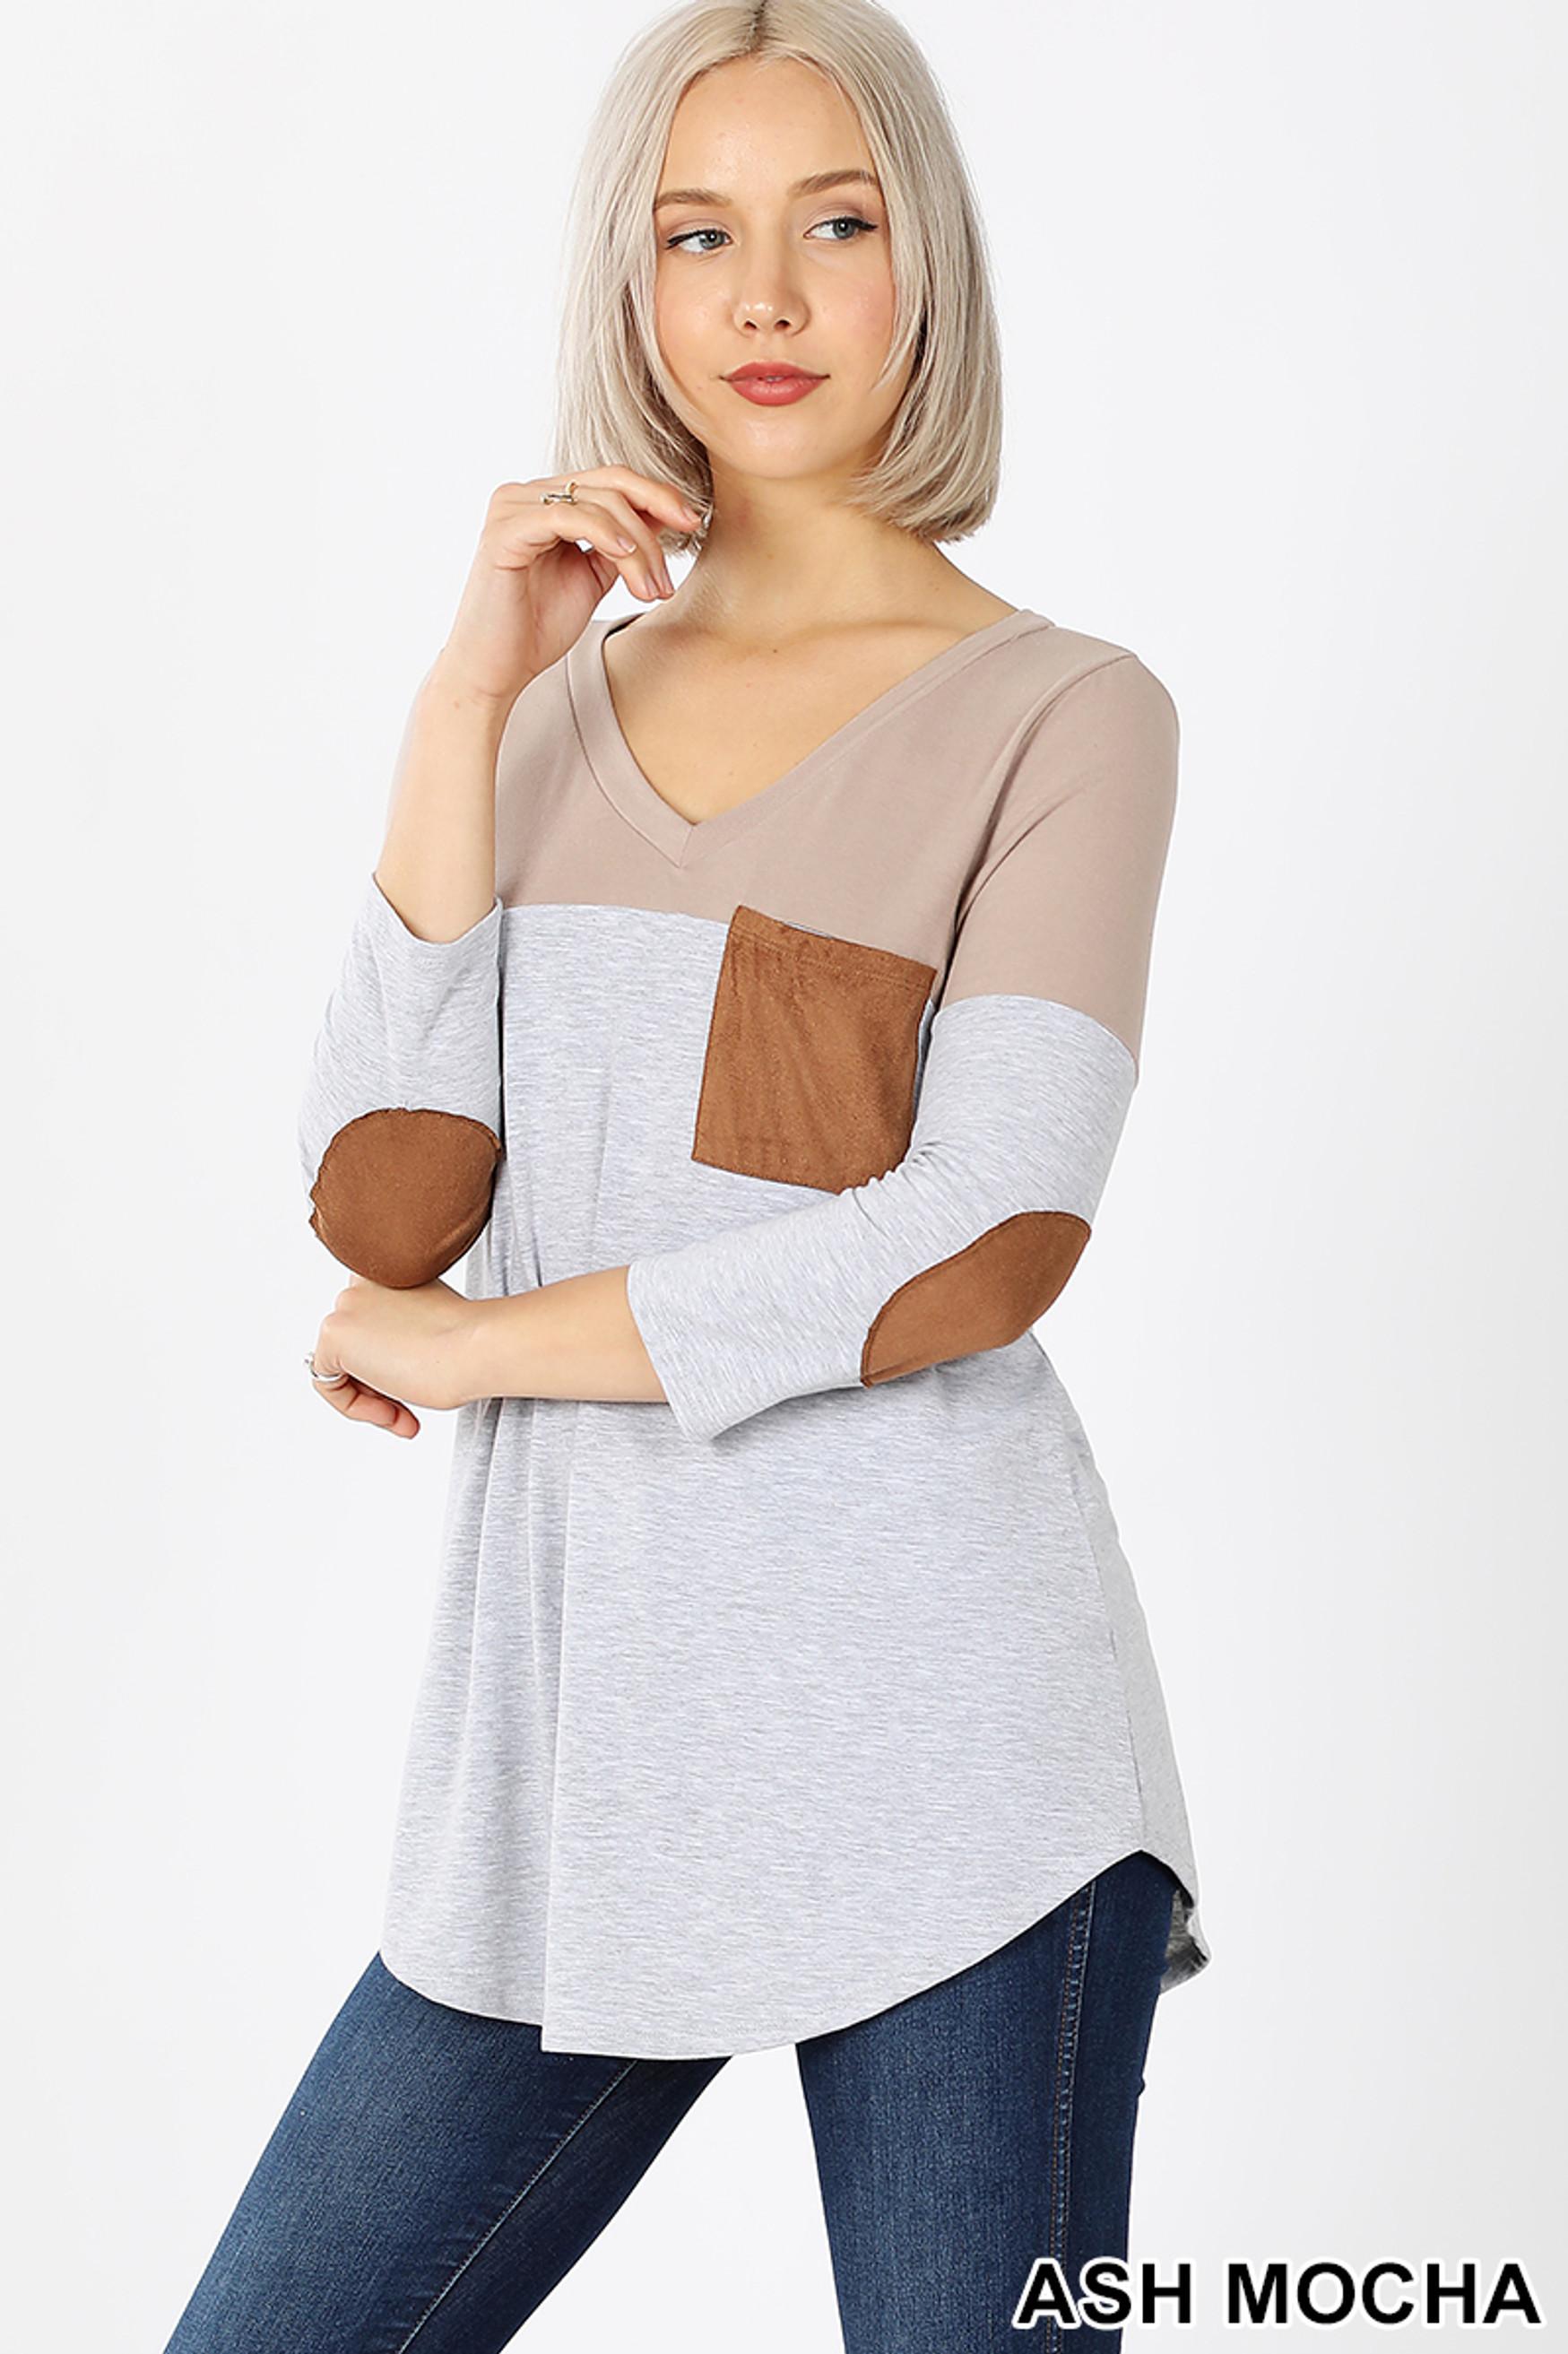 45 degree left view of Ash Mocha Color Block V-Neck 3/4 Sleeve Top with Front Pocket